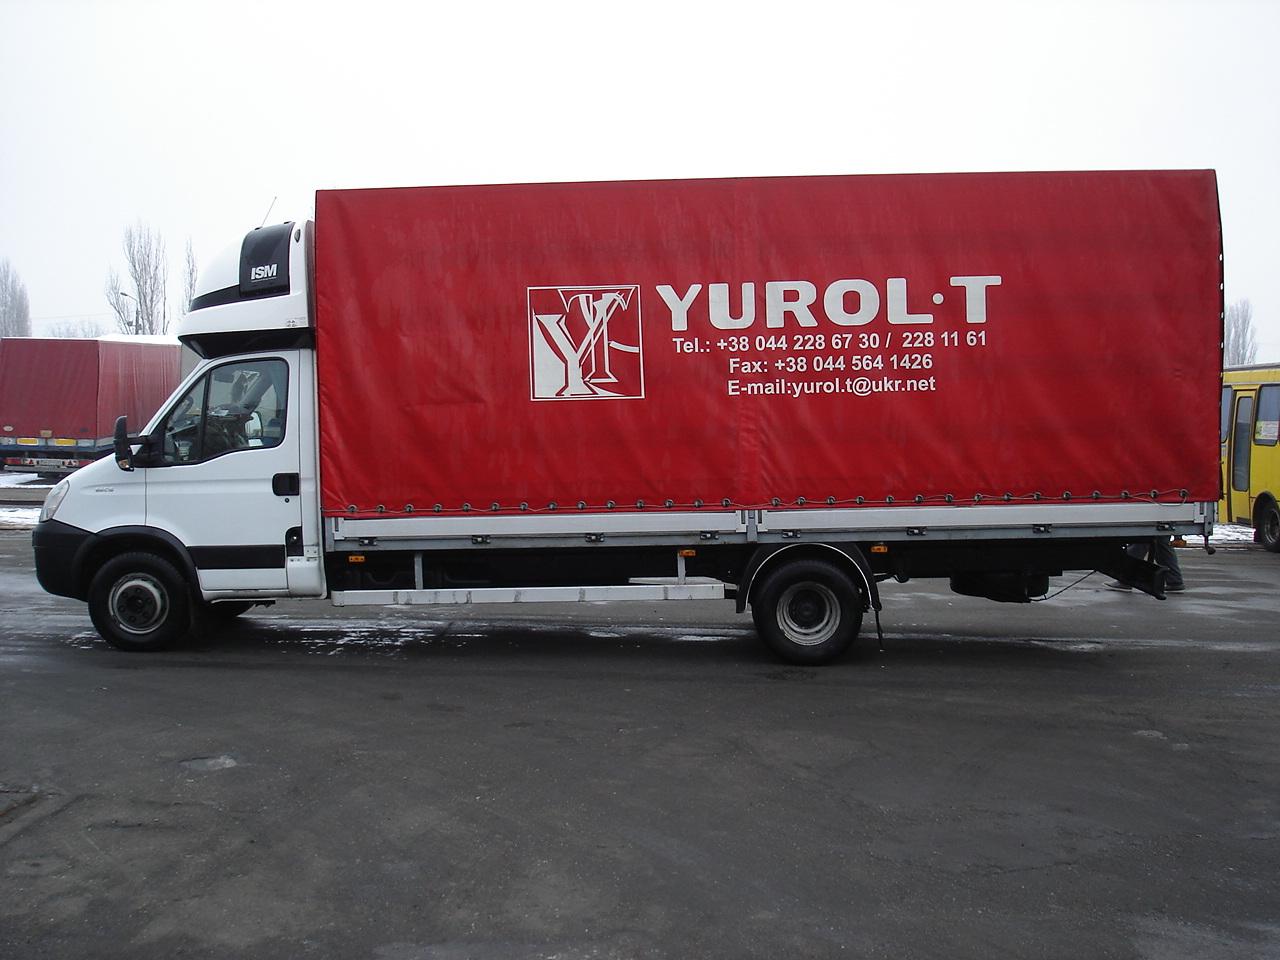 Tented trucks